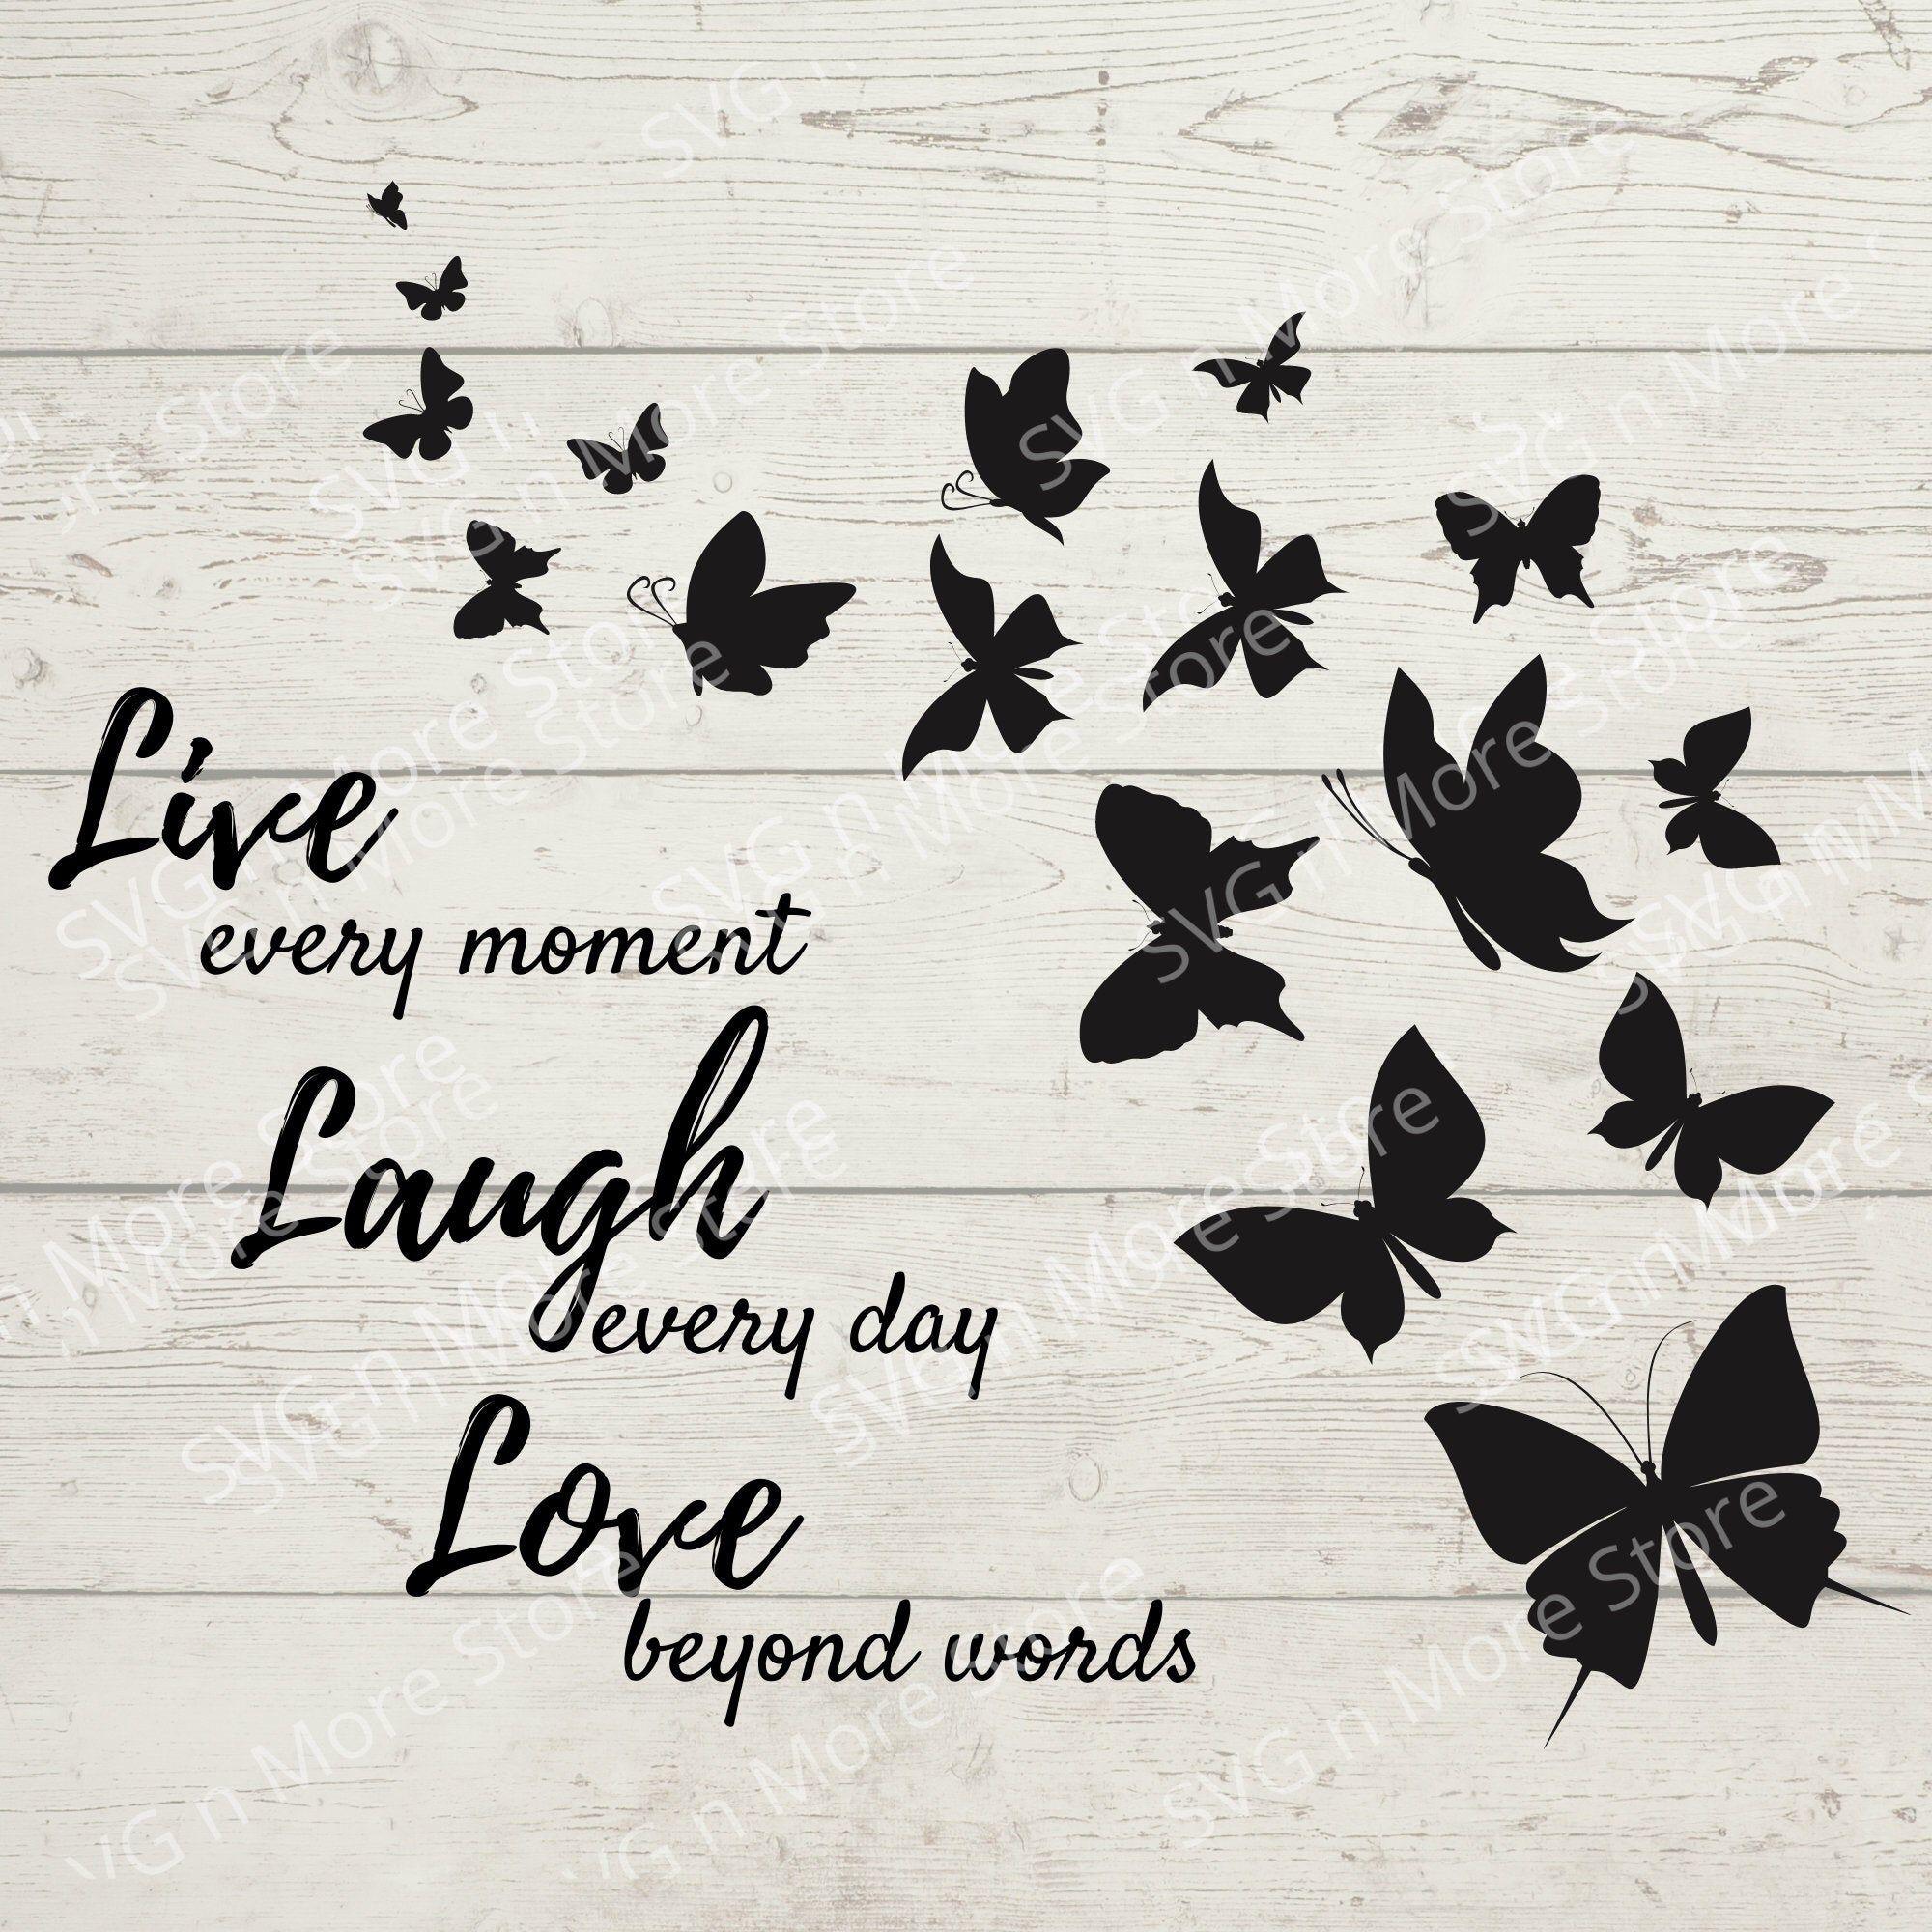 Butterflies Live Laugh Love Quote Svg Files Butterfly Svg Etsy In 2020 Butterflies Svg Quote Svg Files Svg Quotes